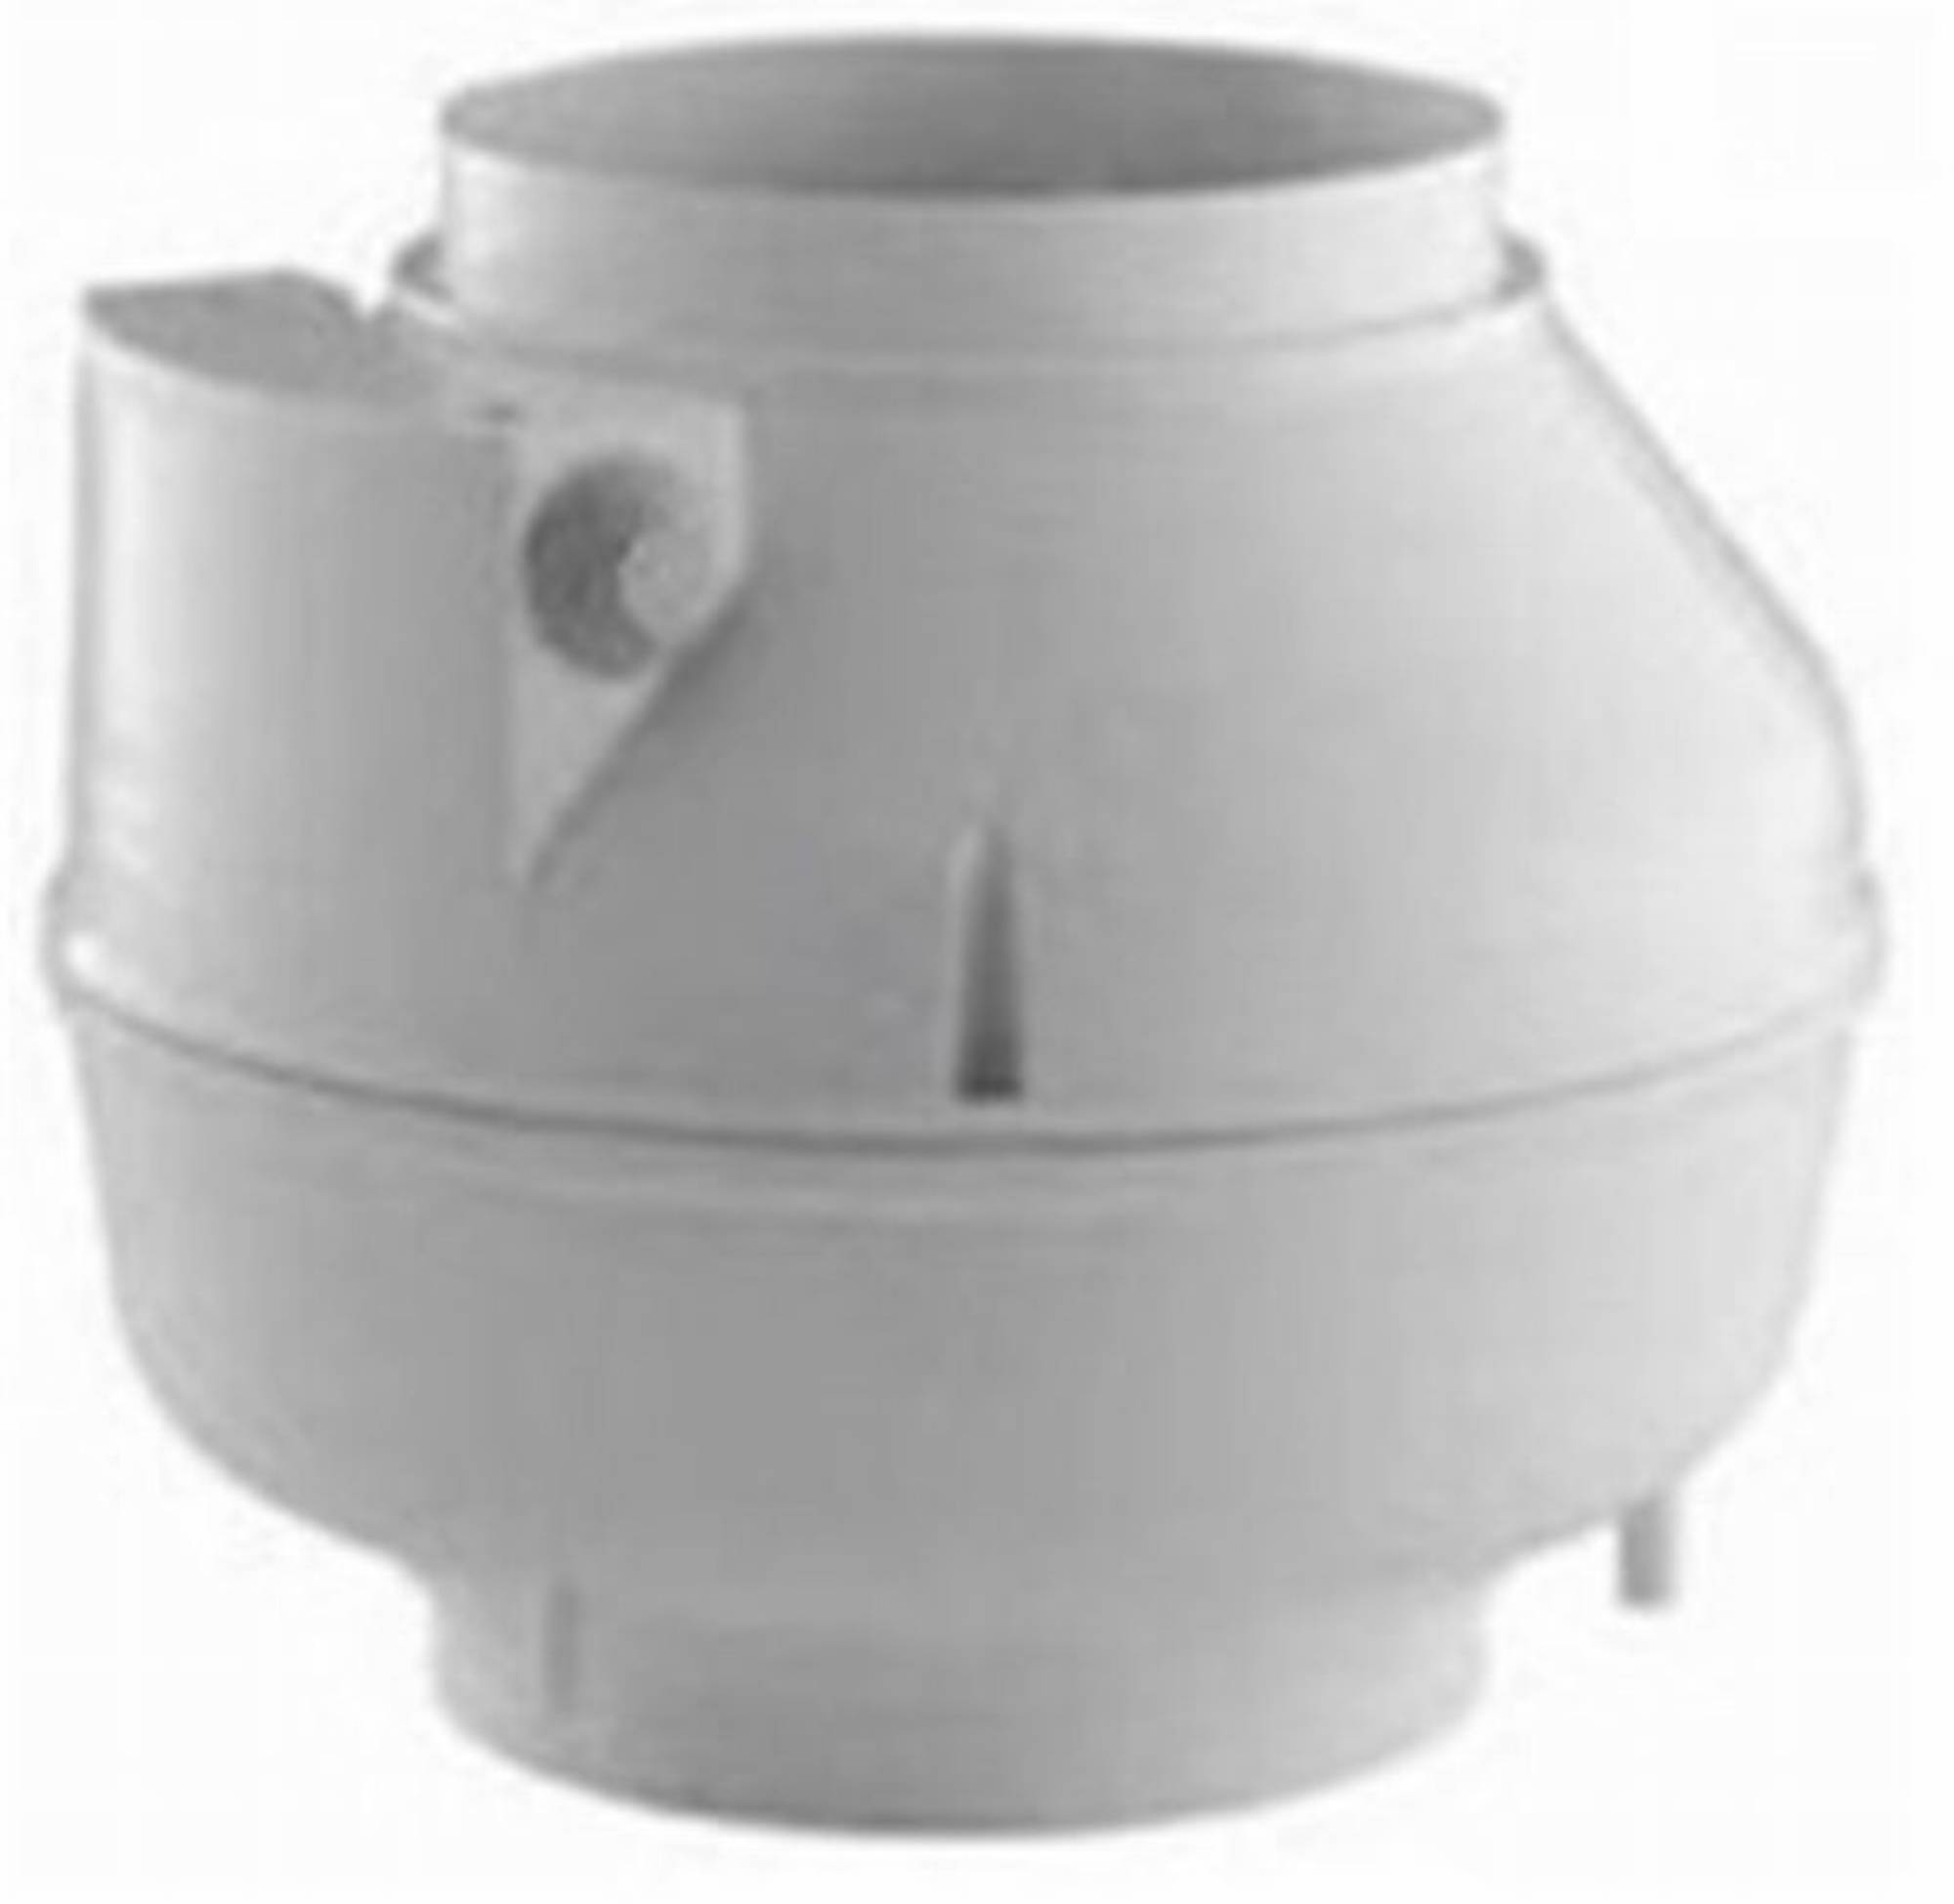 ITHO buisventilator 230v zonder muurmontageset (3804020)